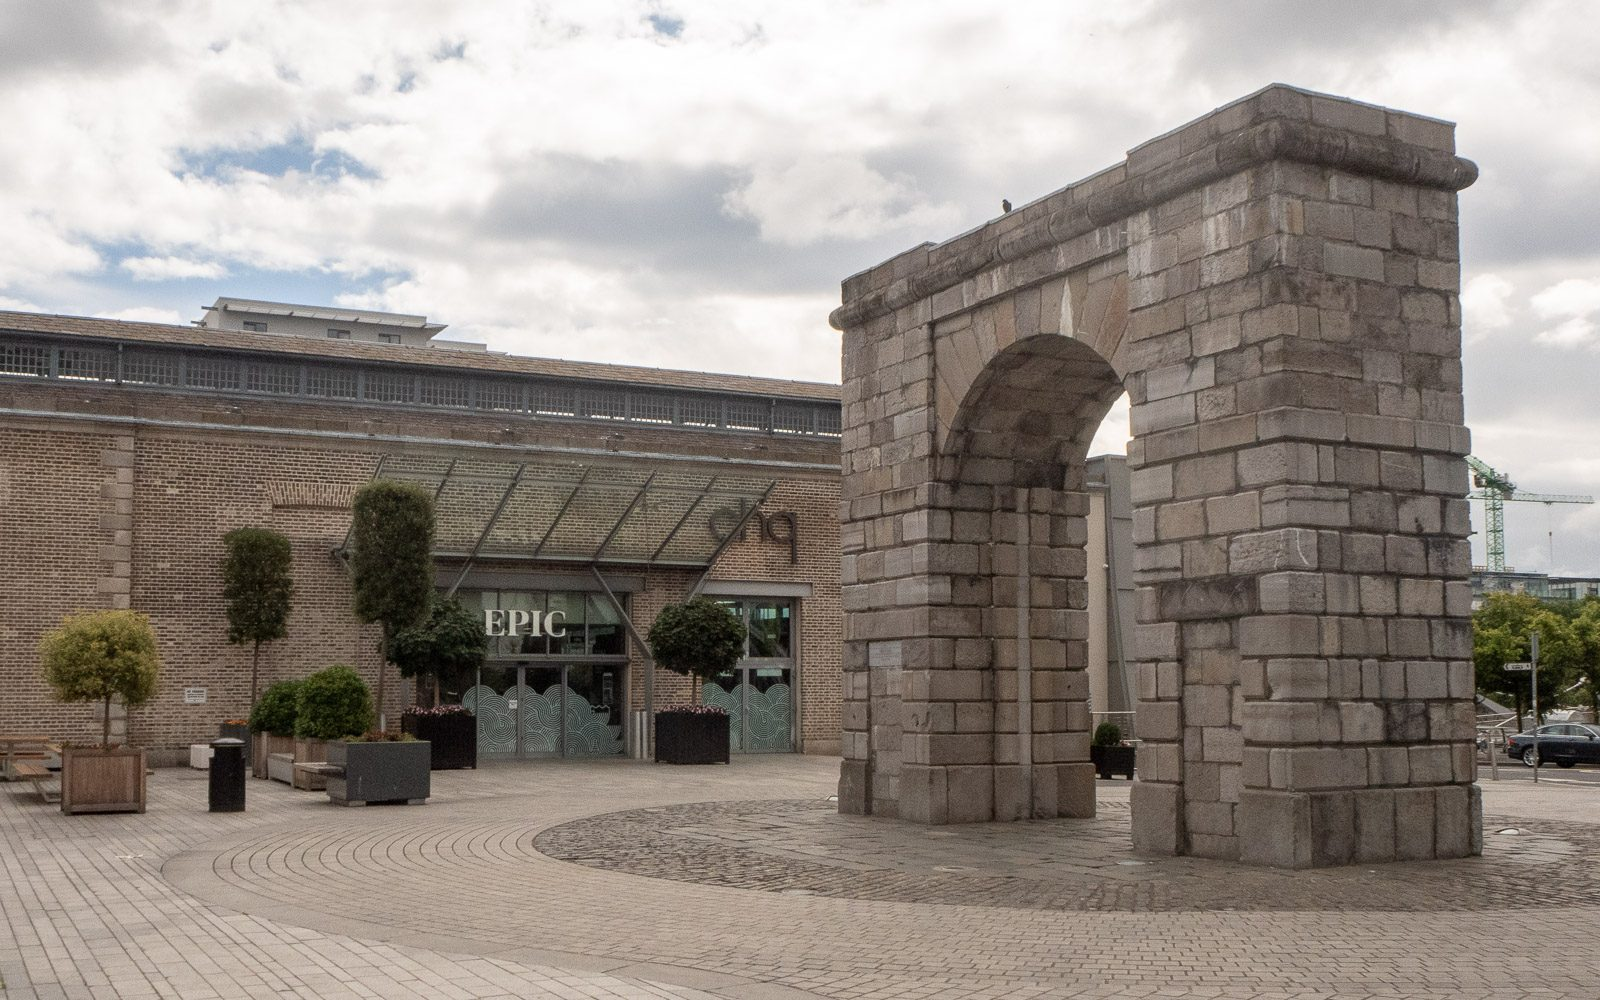 EPIC Dublin